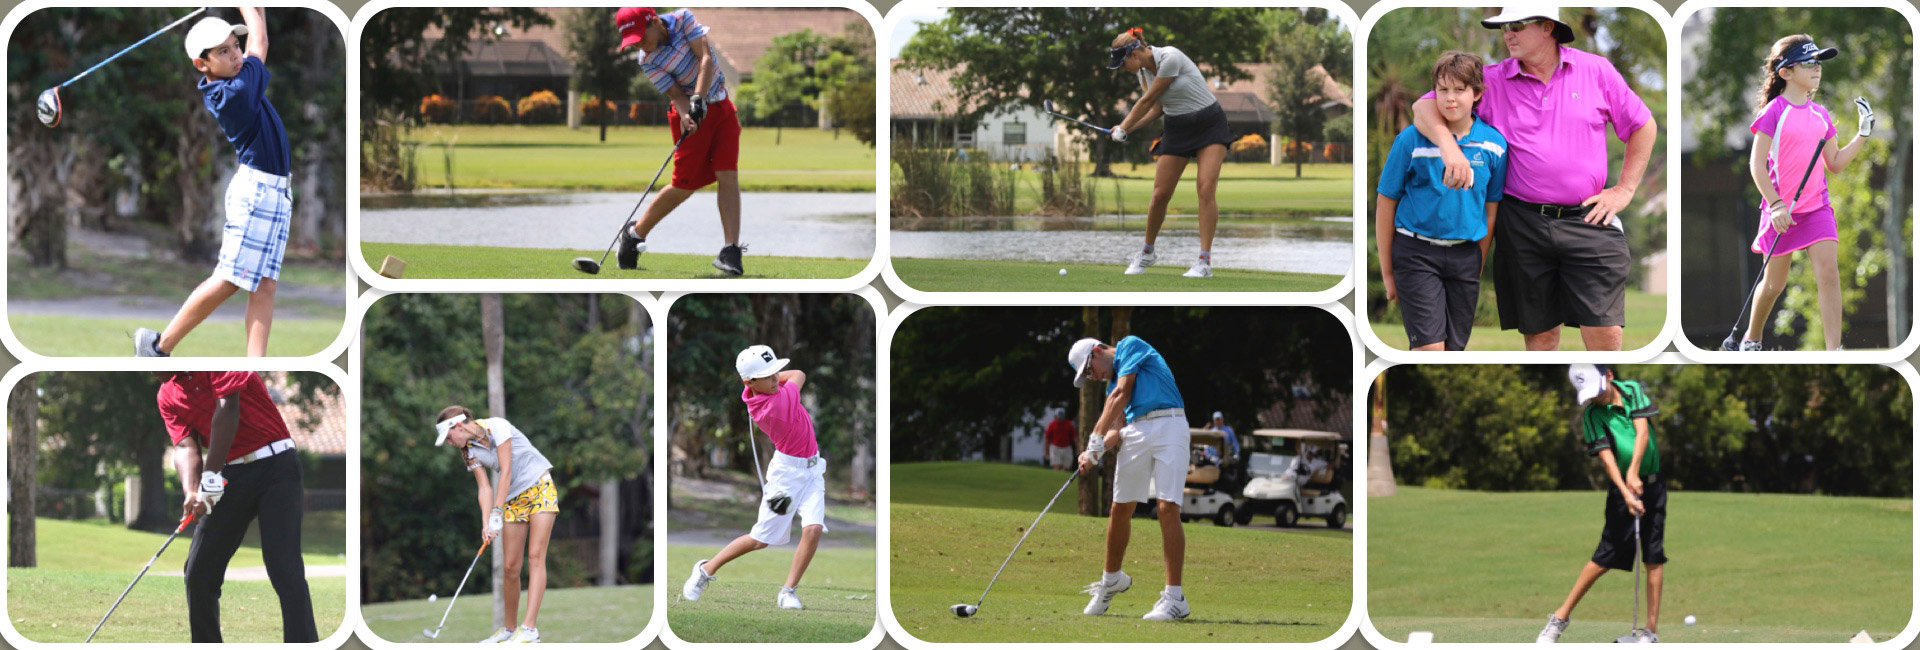 Gold Coast Junior Golf Foundation